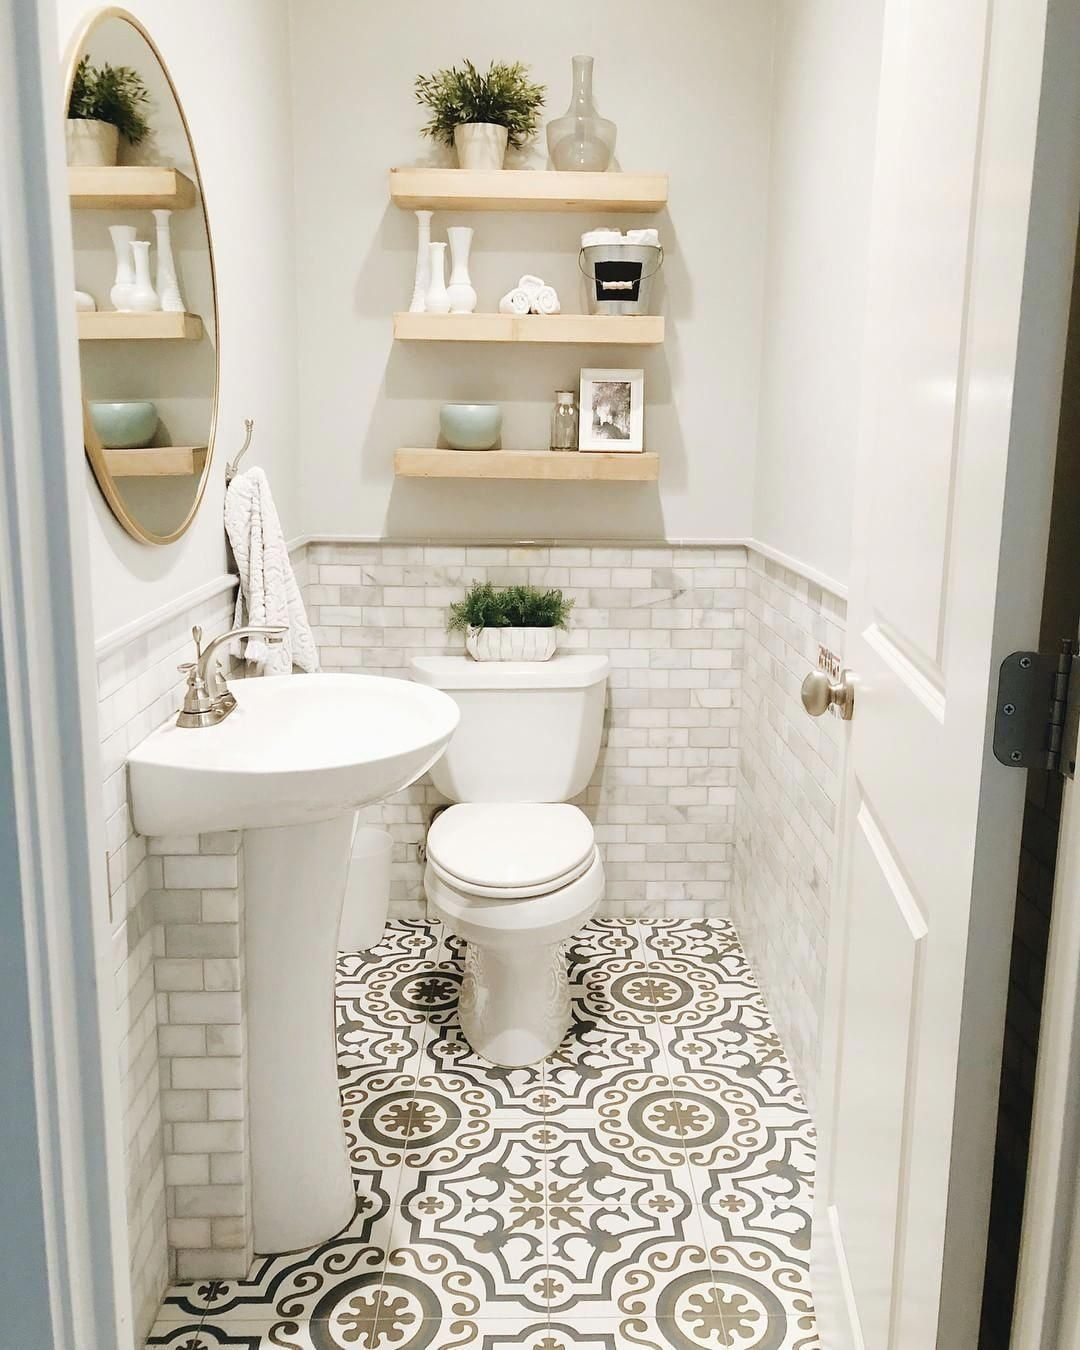 bathroom decor relax #bathroom decor lowes #bathroom decor online